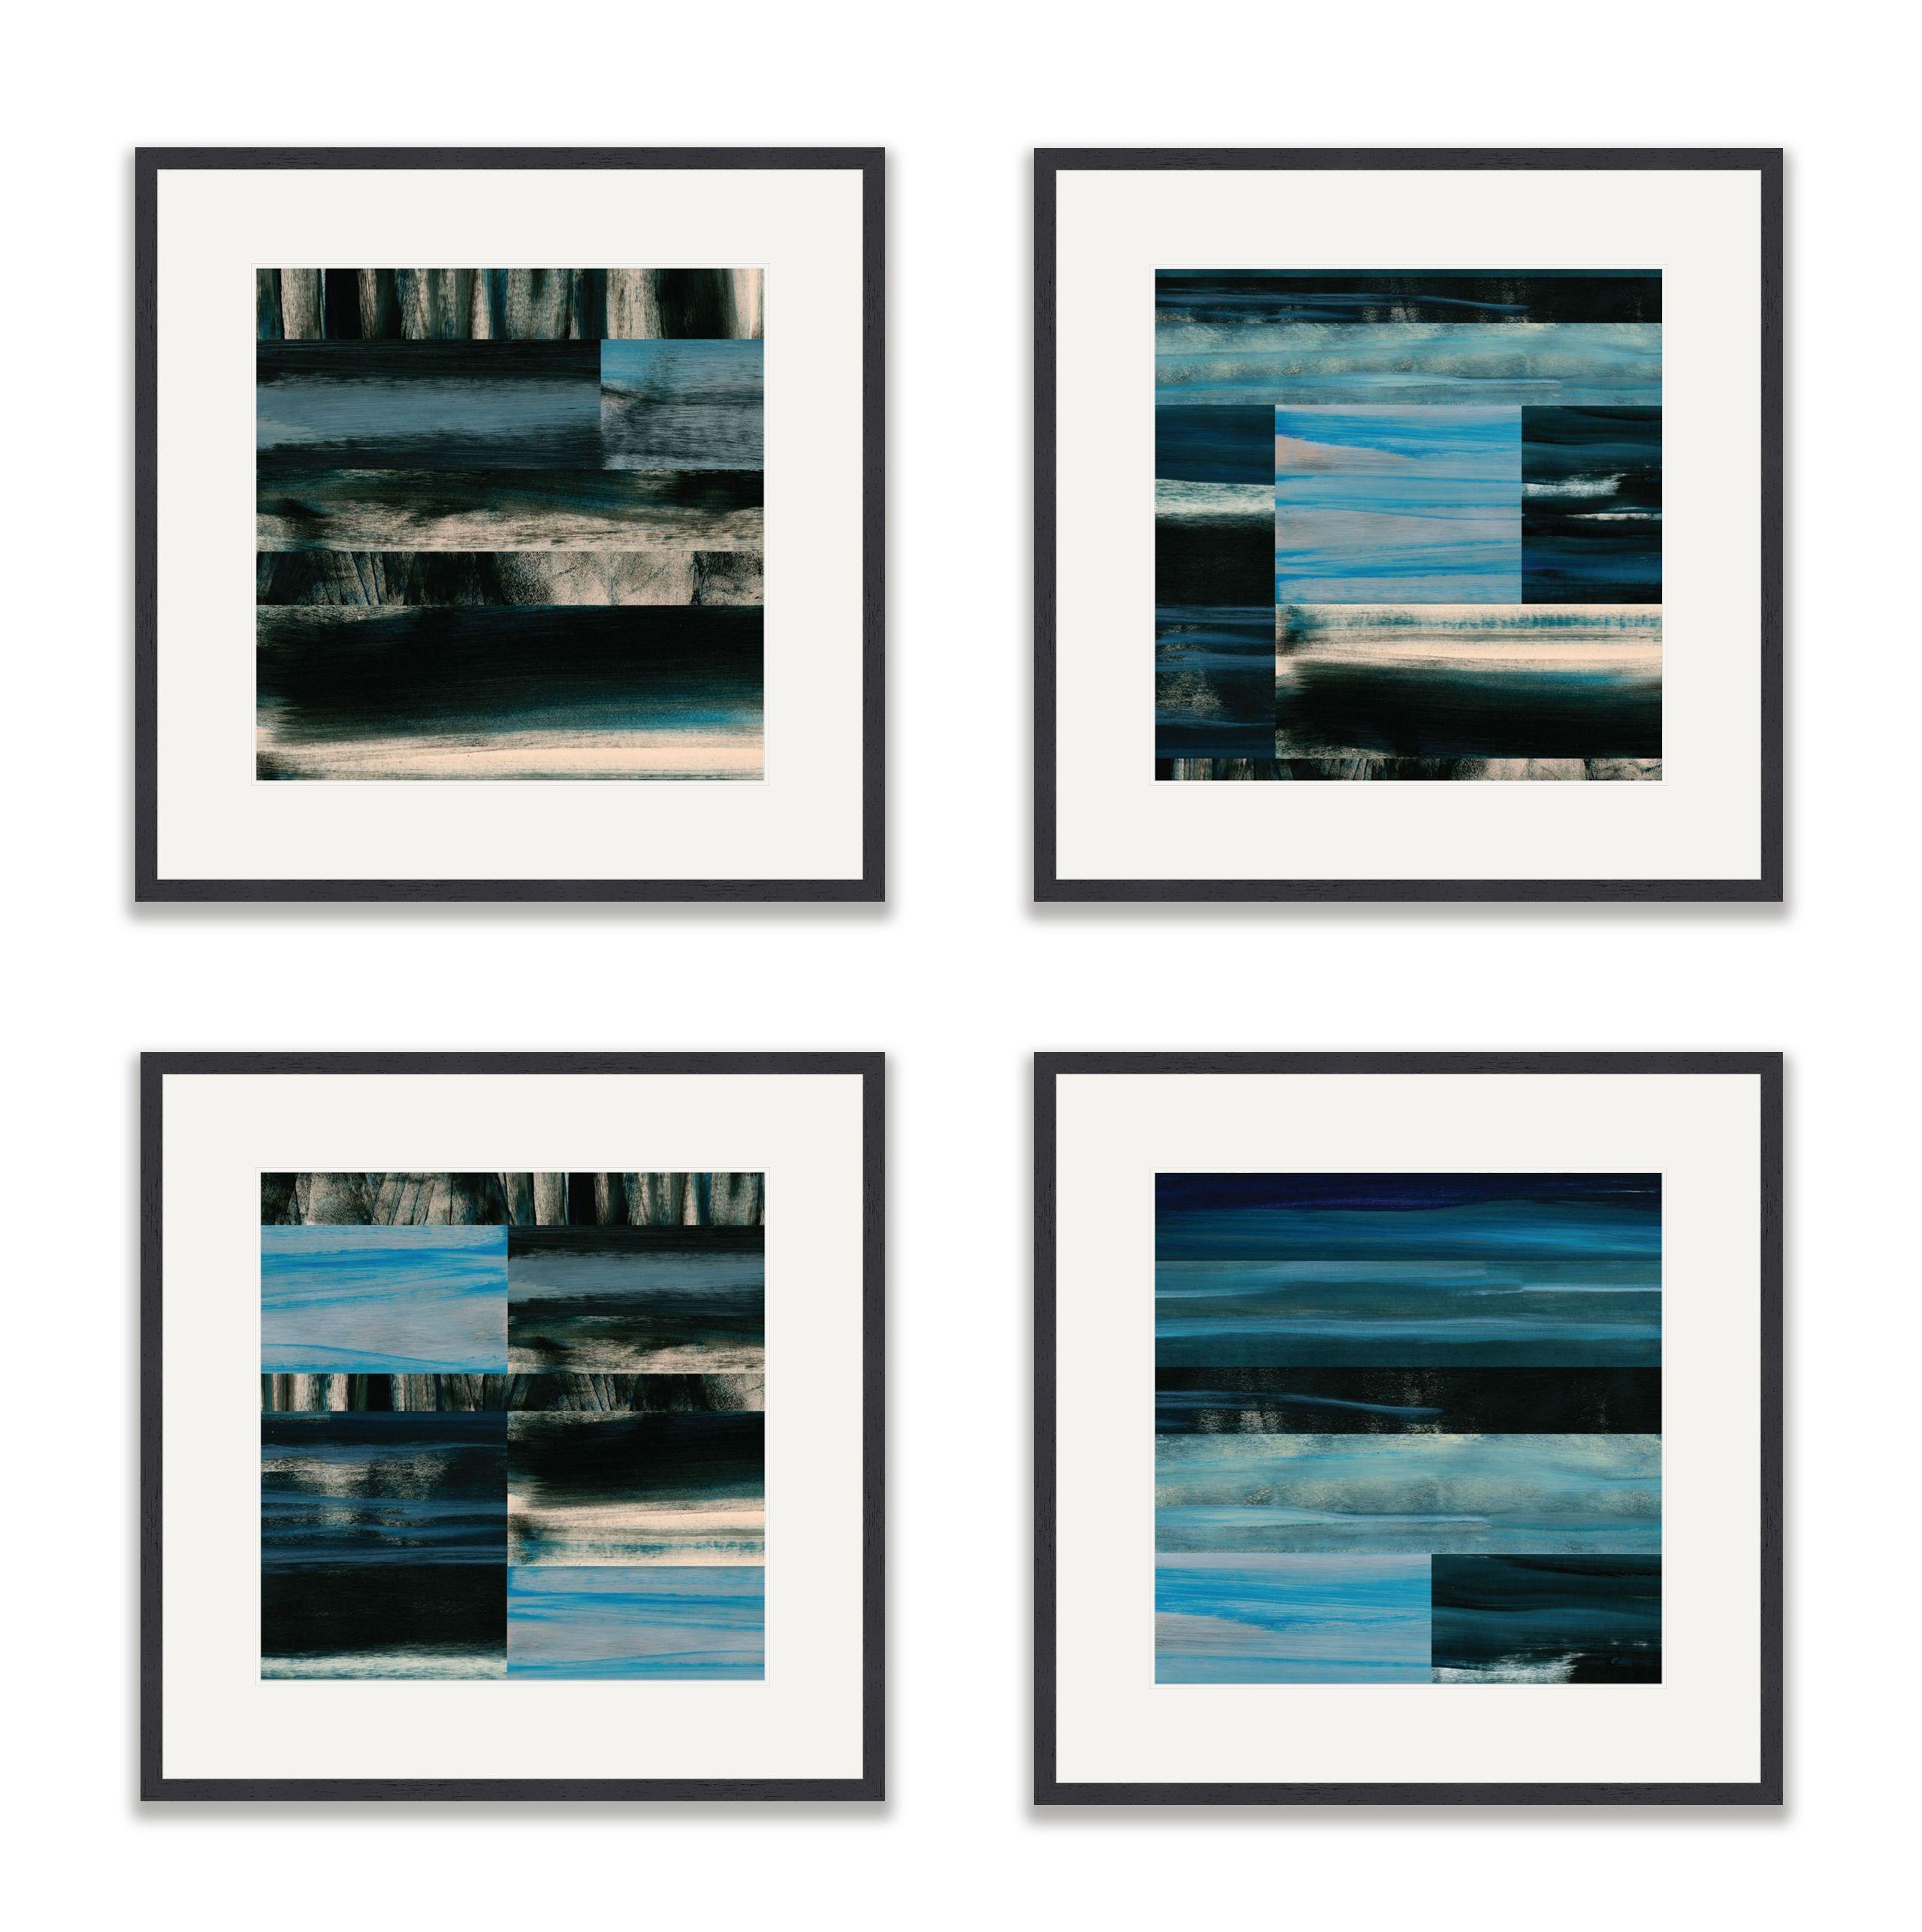 #print #artprint #digitalcollage #charcoal #layeredpaint#collage #blue #white#grey #abstract #moody #mysterious #layering #graphite #charcoal #black #white #bw #monochrome #ink #inkandbleed #inkandwater #pencil #drawing #freehand #expressive #marks #digitalart #digitallayering #photoshop #artforinteriors #interiordesign #texture #forsale #sale #buy #tobuy#bespoke #prints #artprint #drawing #illustration #art #artwork #artdesign #design #madeinnottingham #madeintheuk#nottingham #ukartist